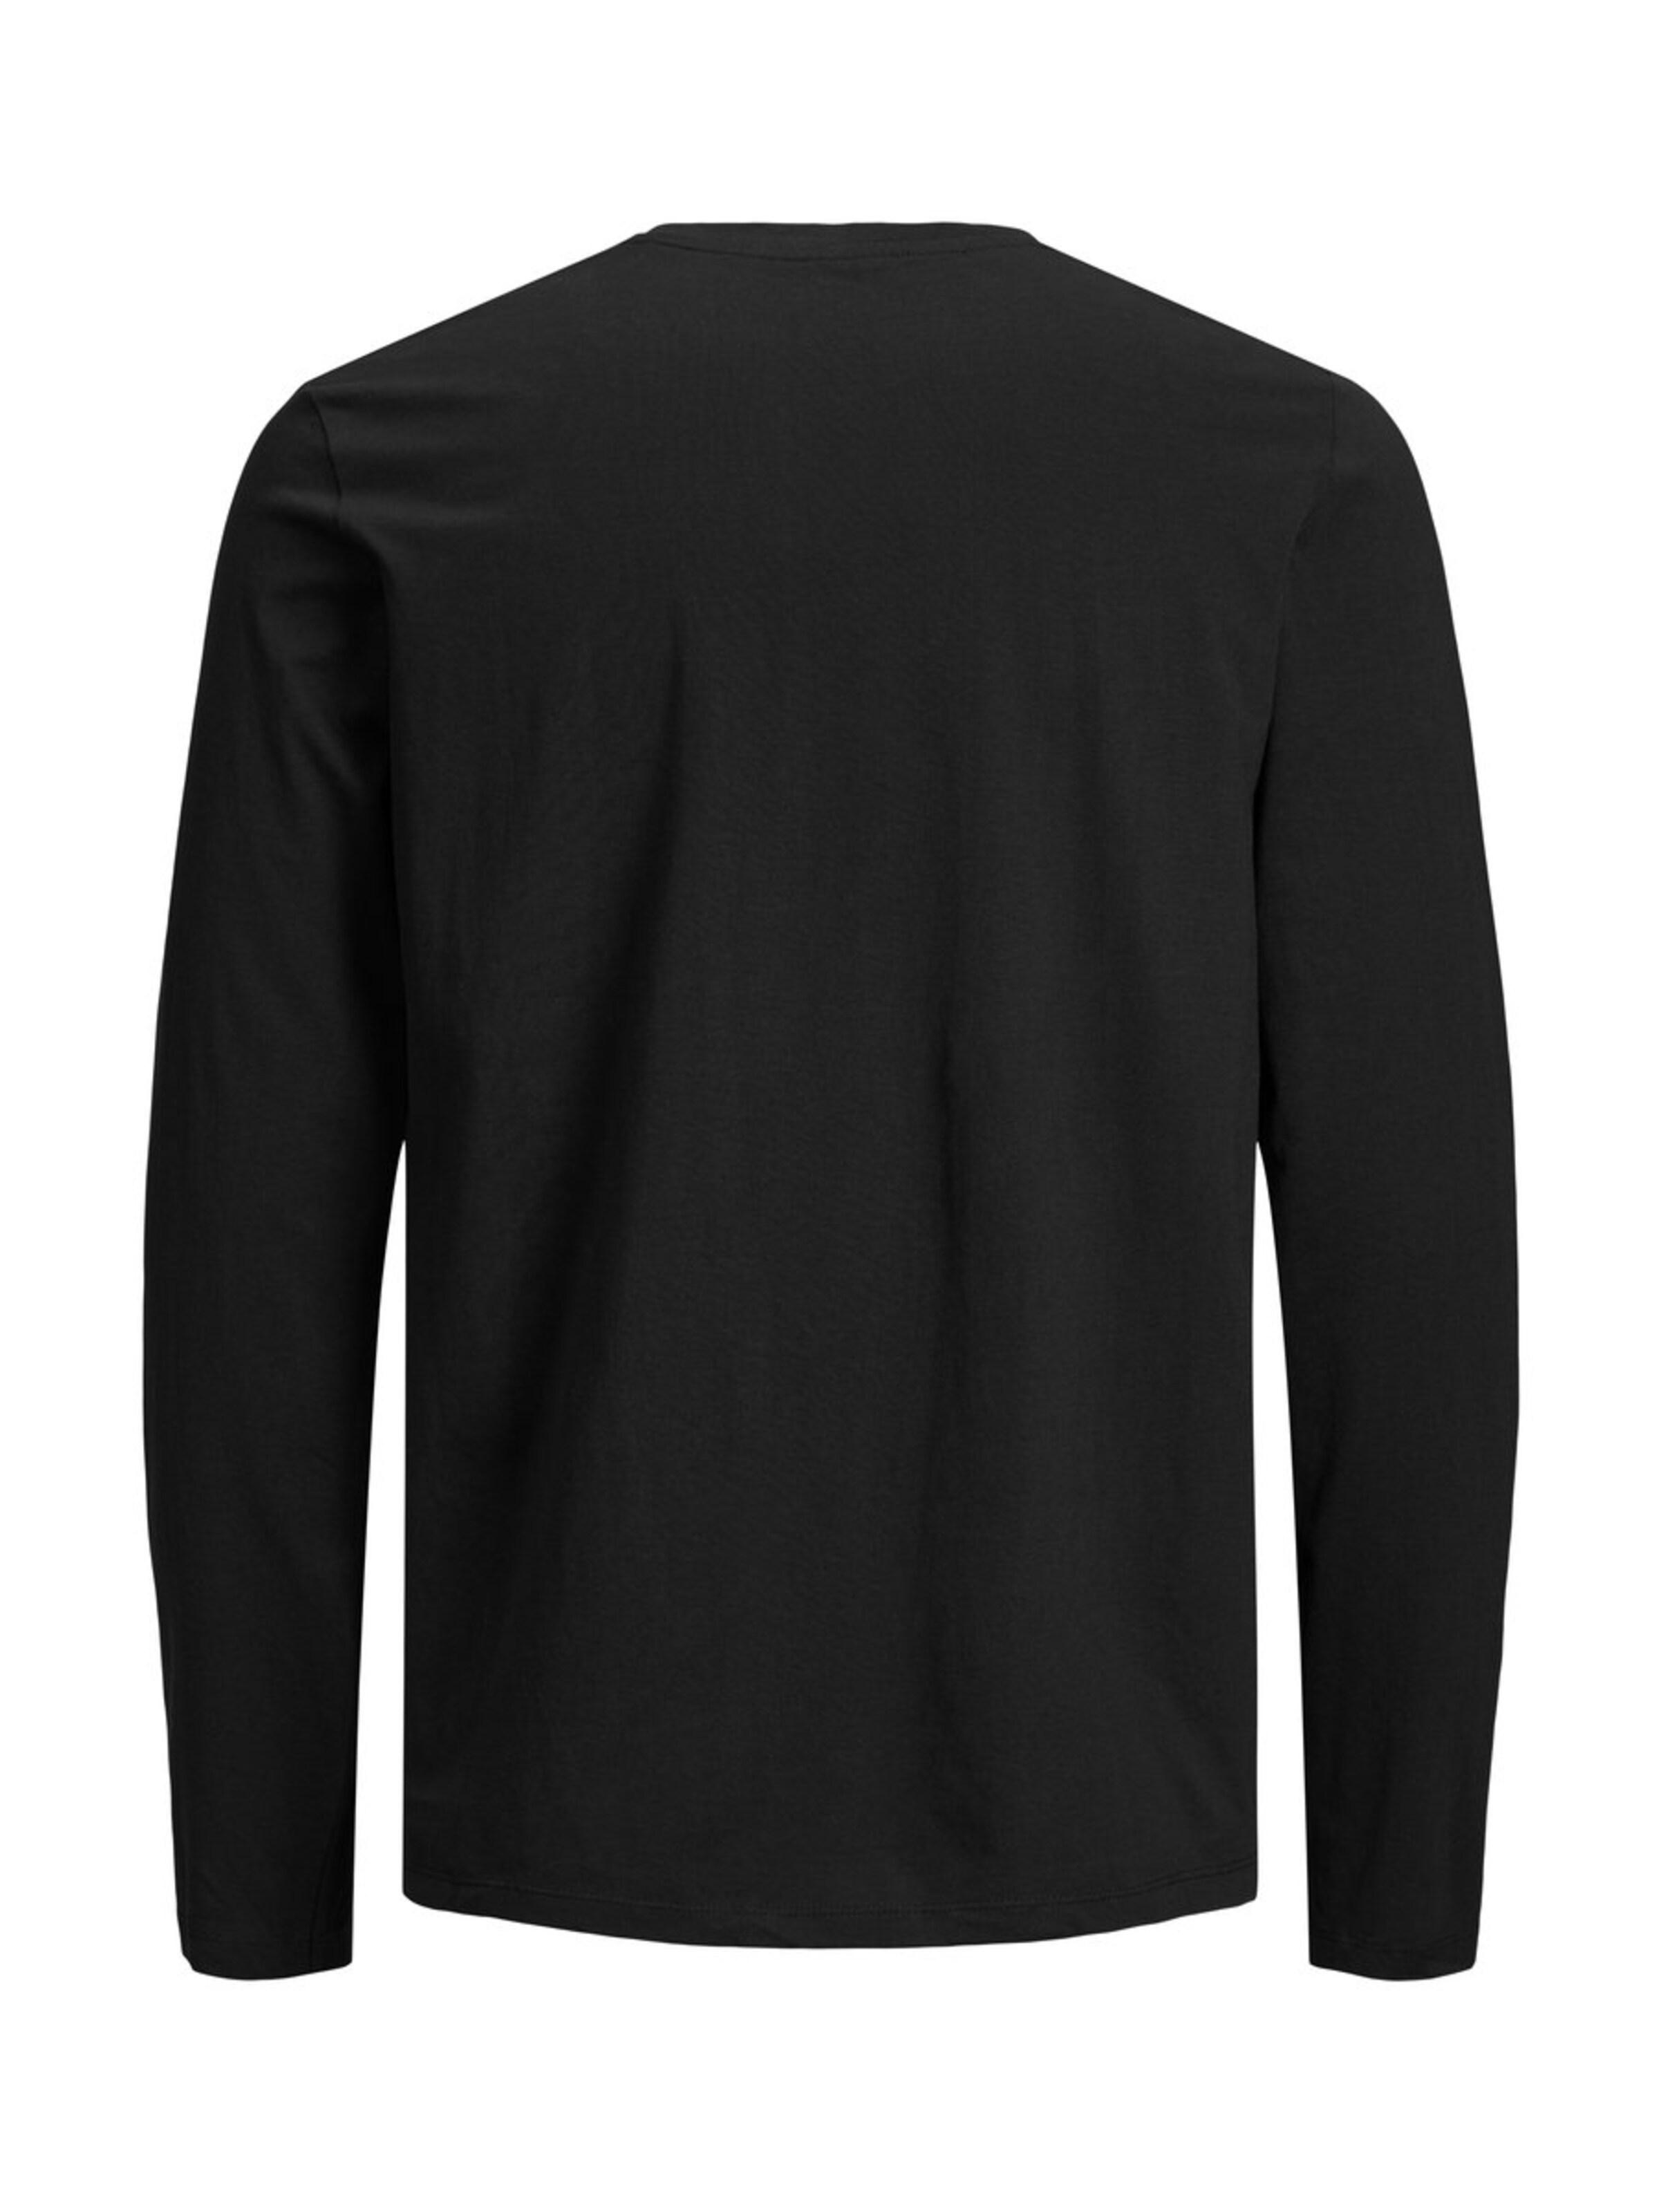 T Jones shirt JauneNoir En Jackamp; bgvY6f7y